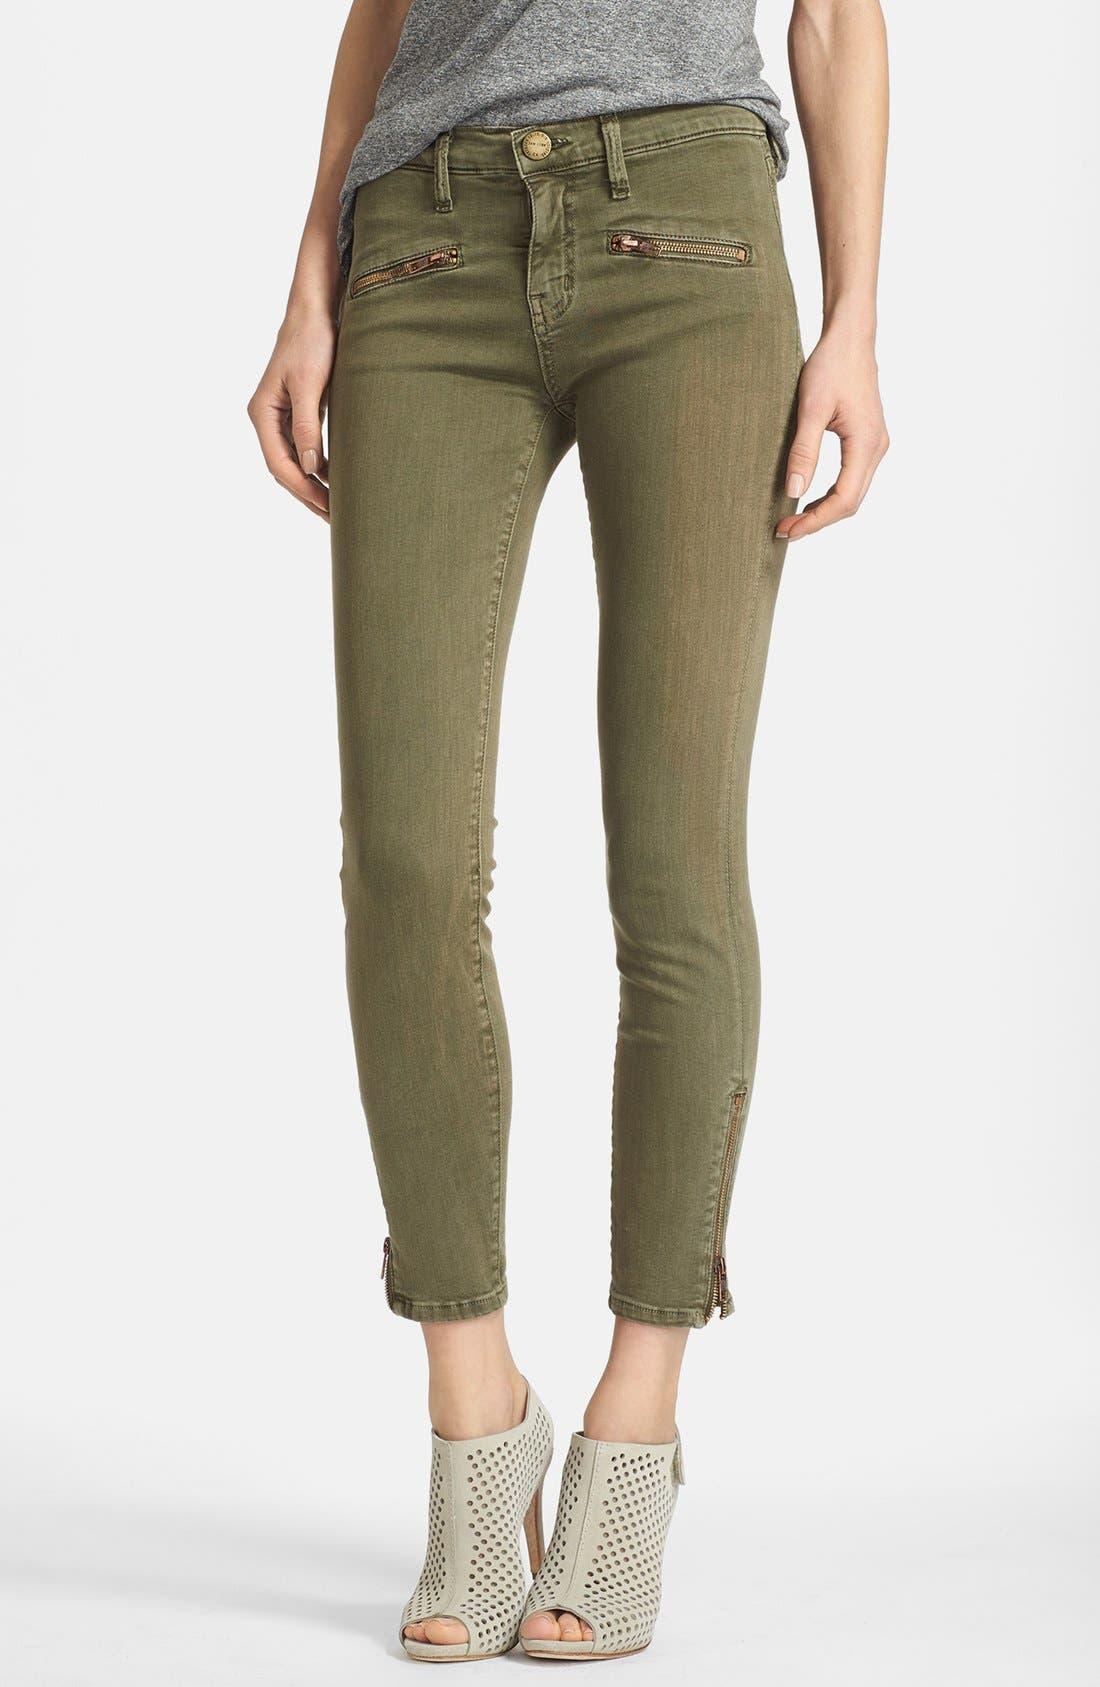 Main Image - Current/Elliott 'The Soho Zip Stiletto' Skinny Jeans (Army)